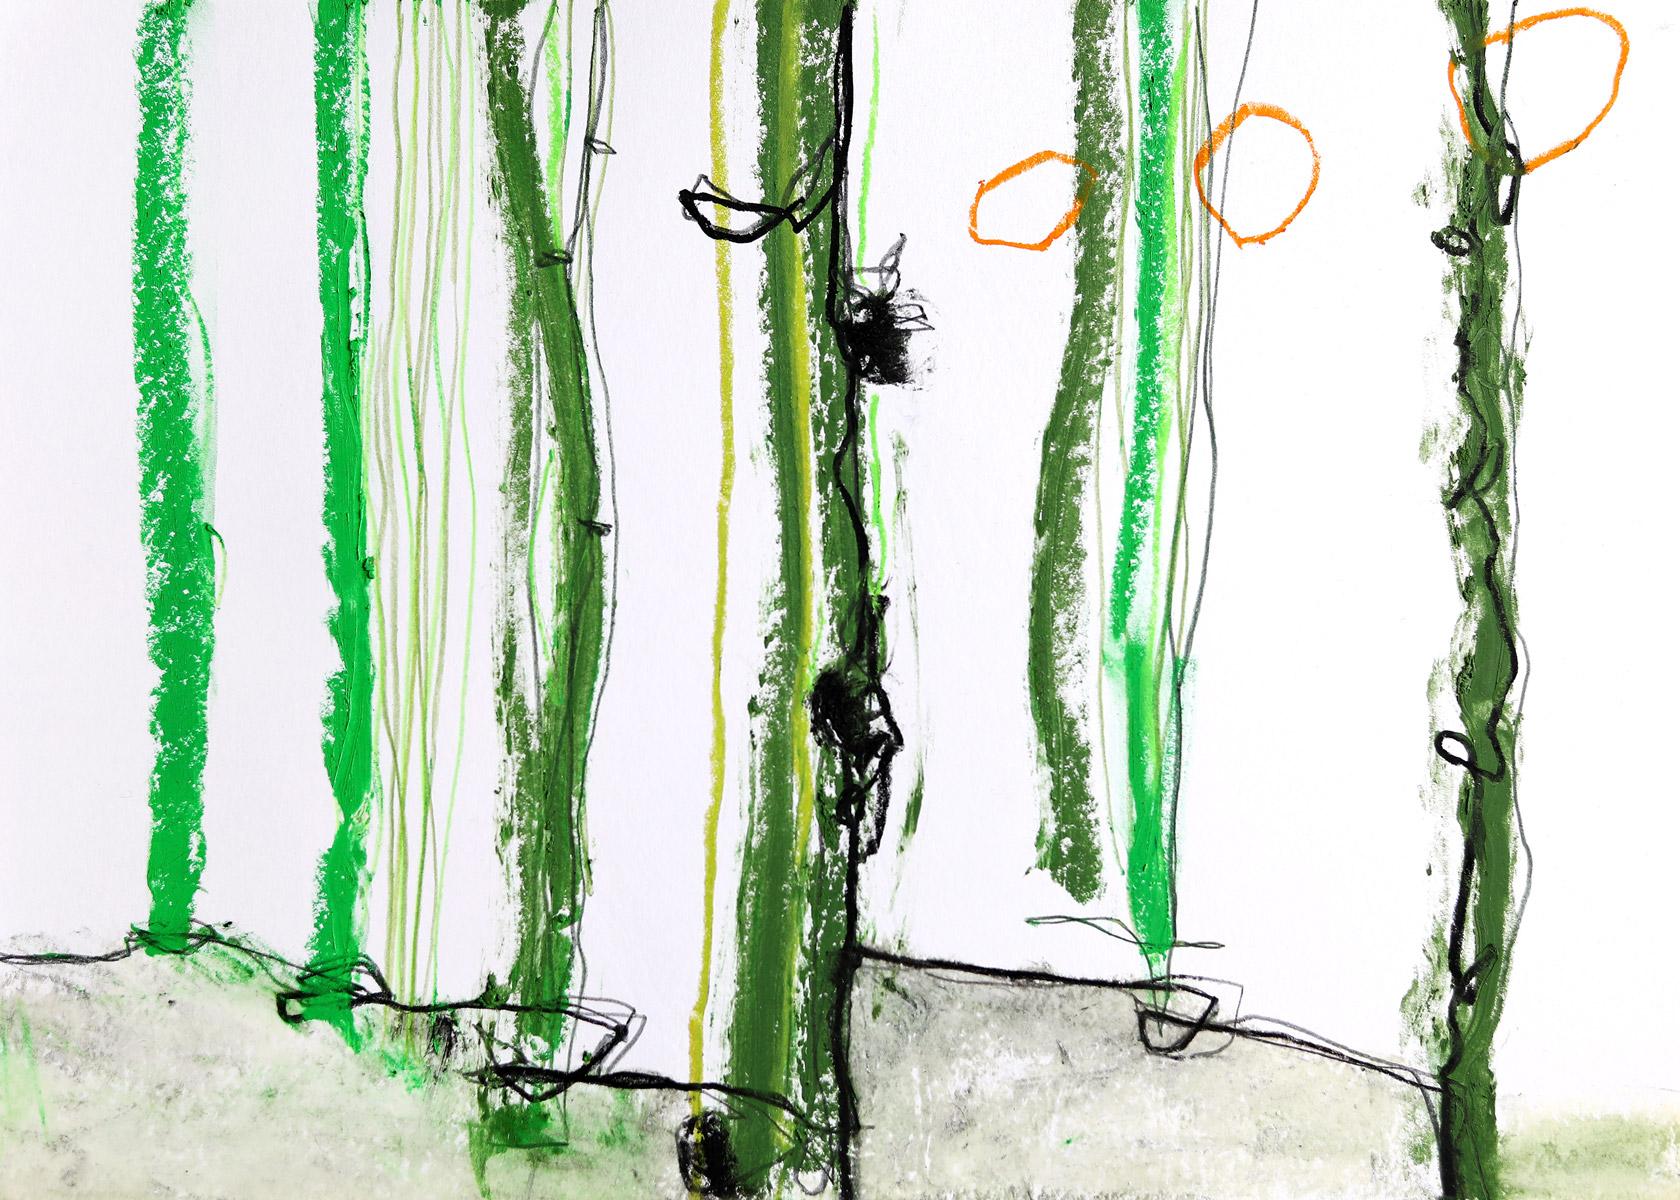 singula, 2018, Ölstick auf Papier, 42cm x 29,7cm